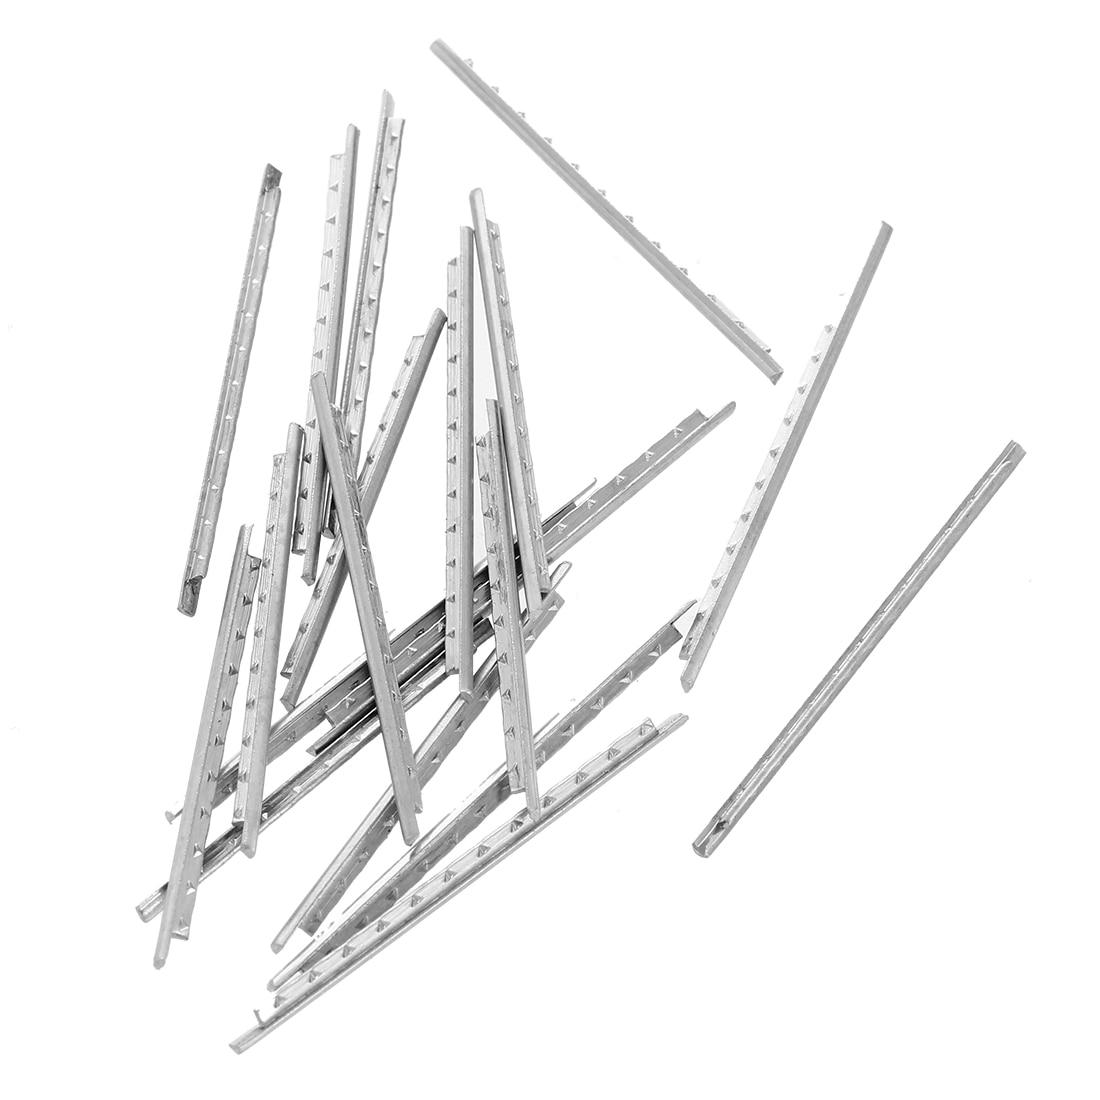 19pcs Fret Wire Copper Fretwire Set 1.7mm For 26